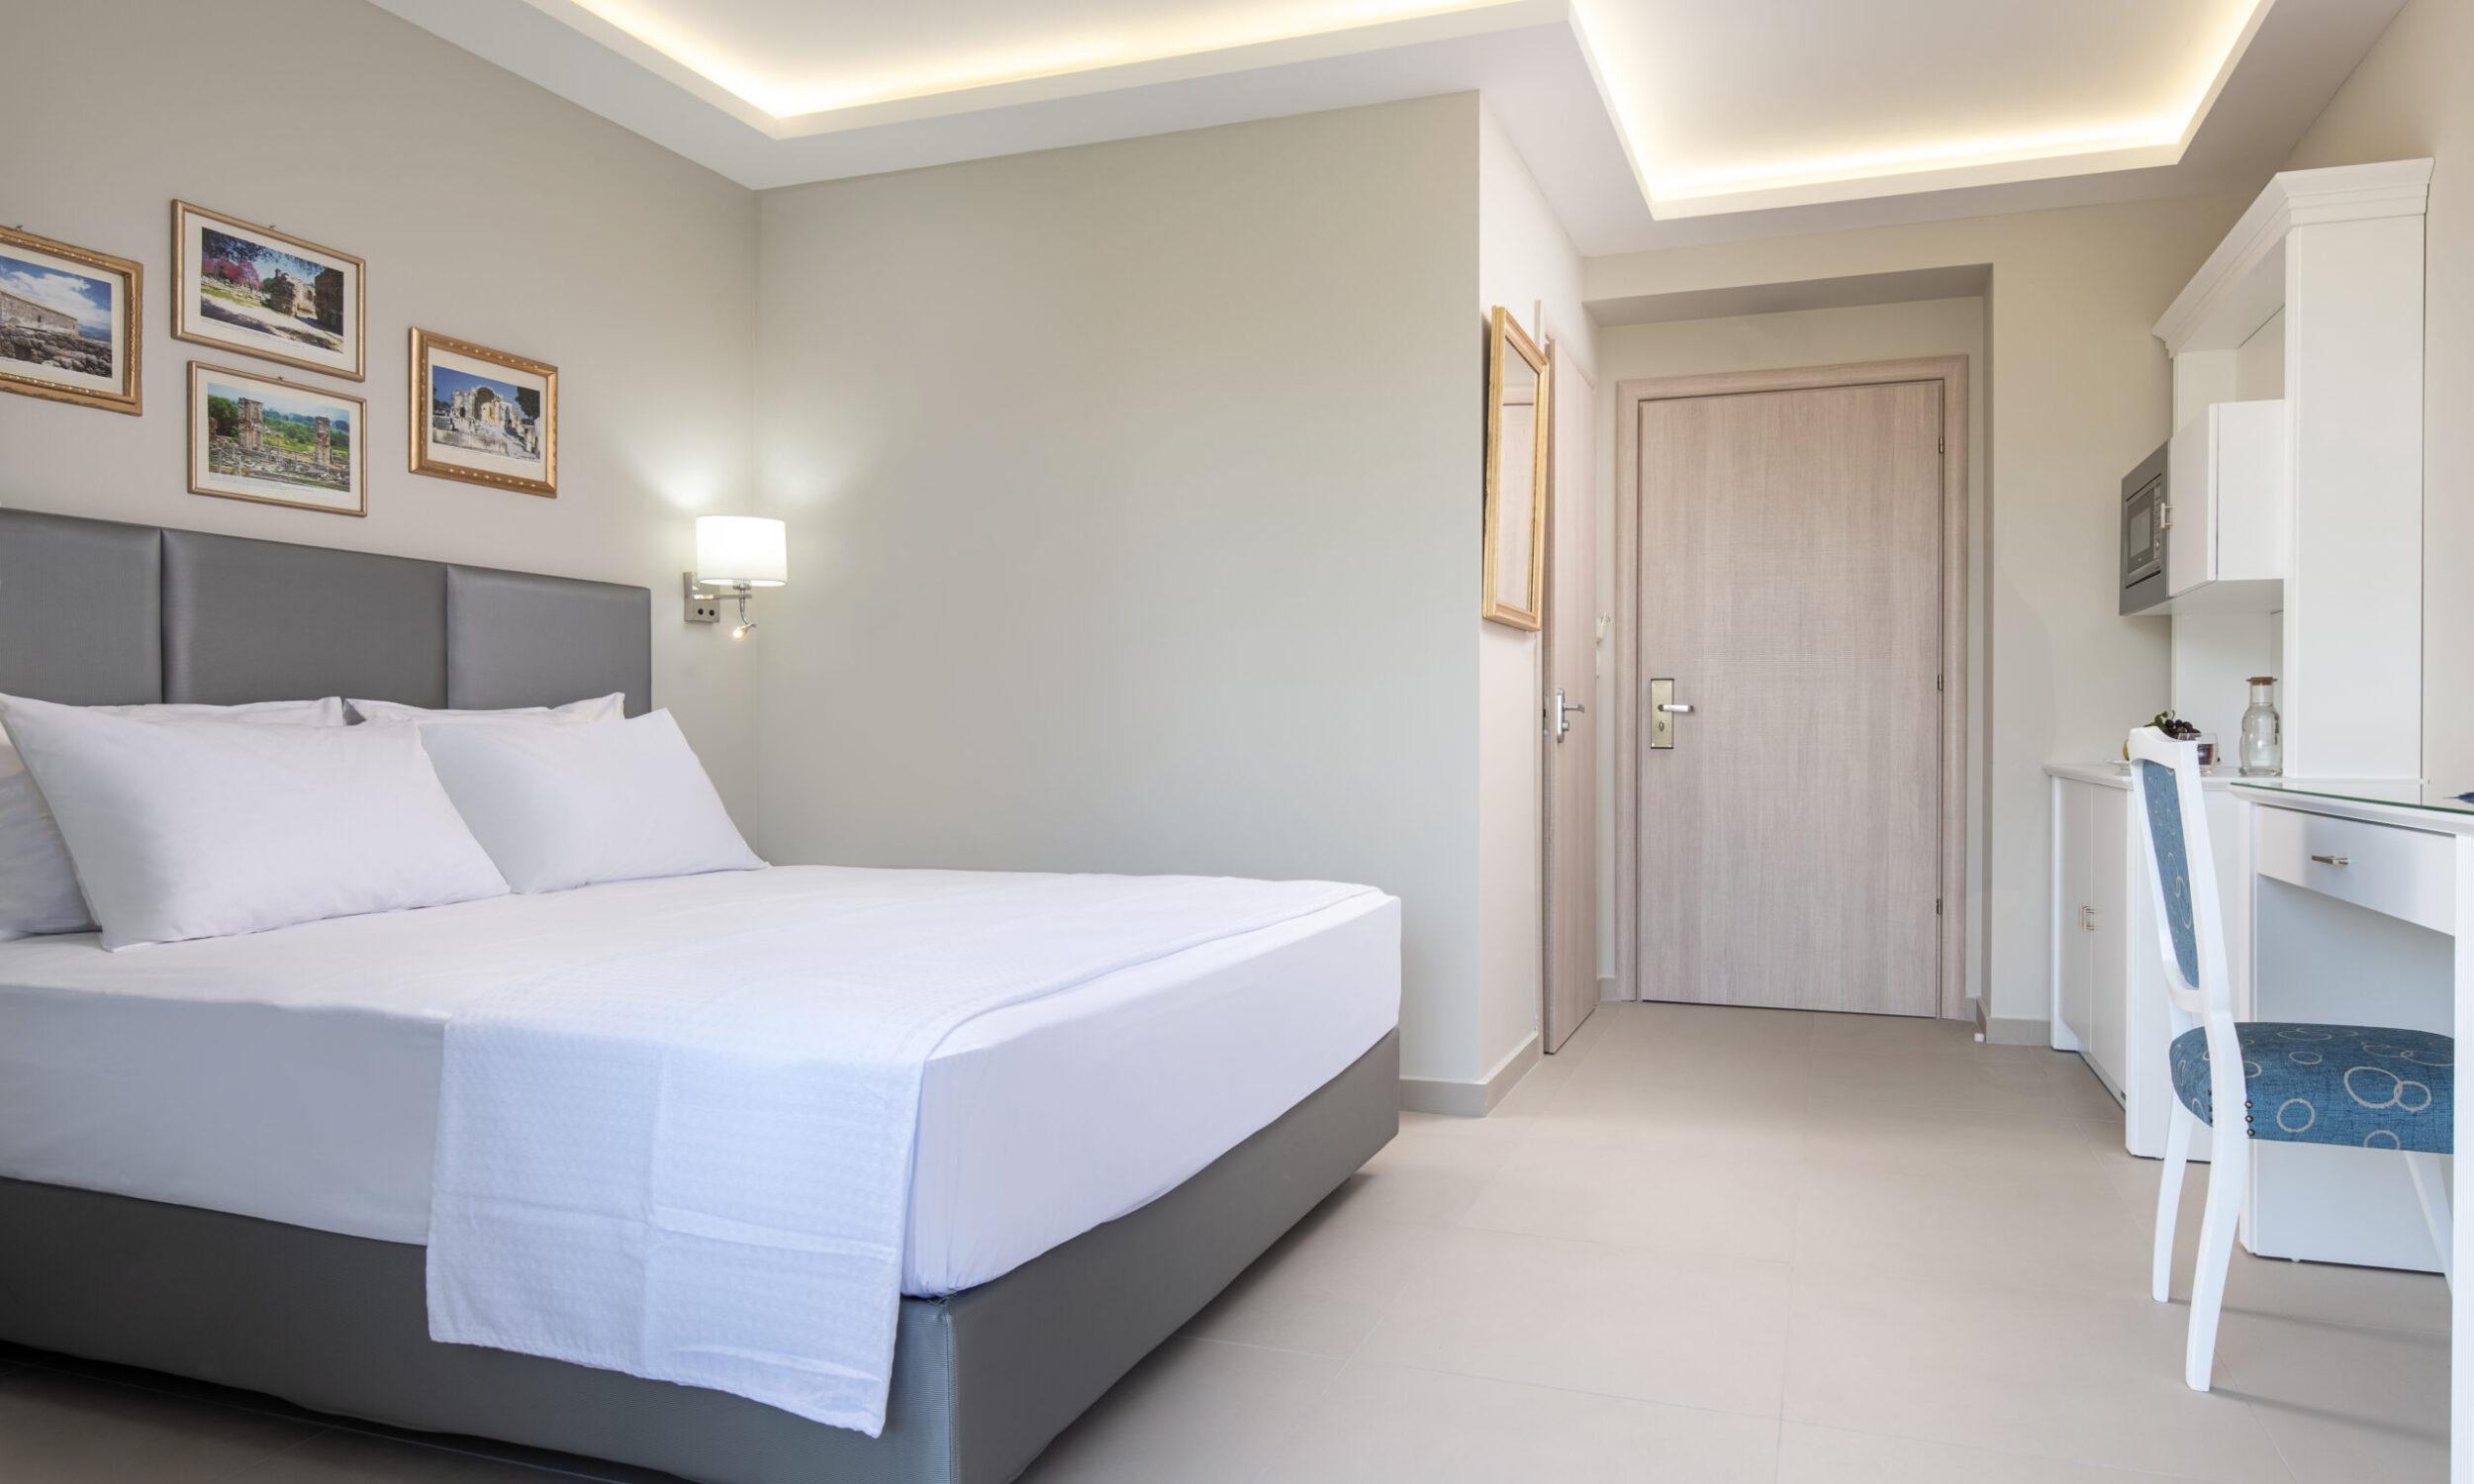 DSC_1629-scaled-2500x1500 Το Ξενοδοχείο μας